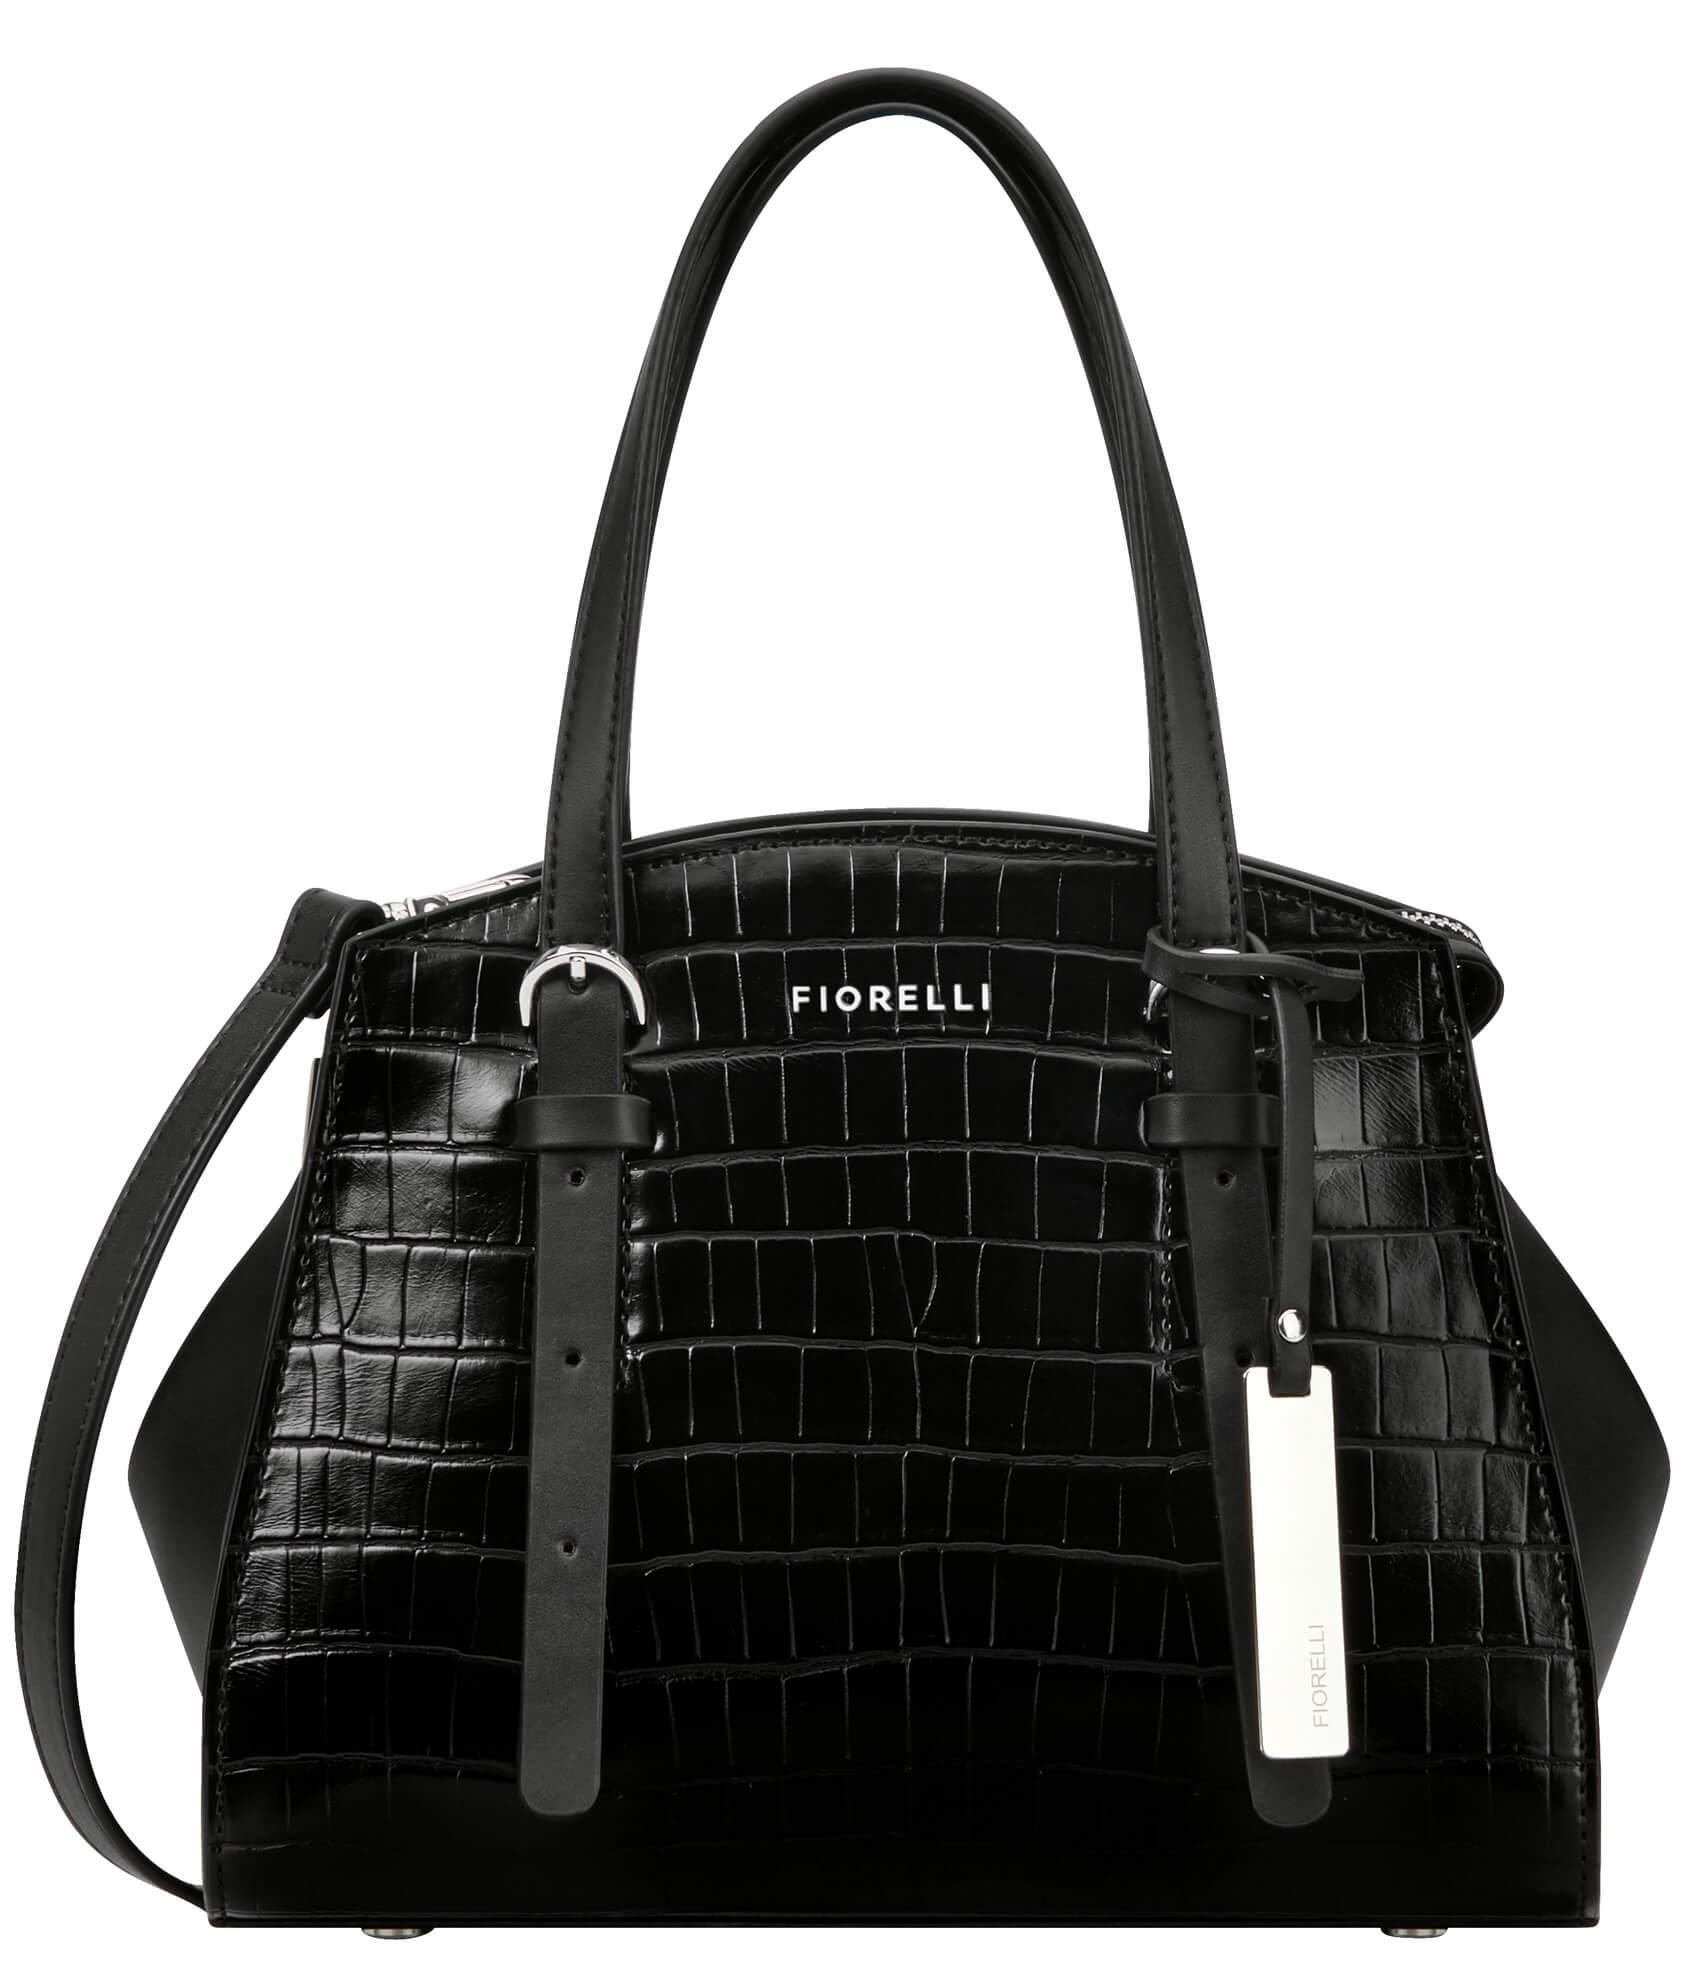 Fiorelli Elegantná kabelka Clarendon FWH0437 Black Croc Doprava ... deceb7aaba3